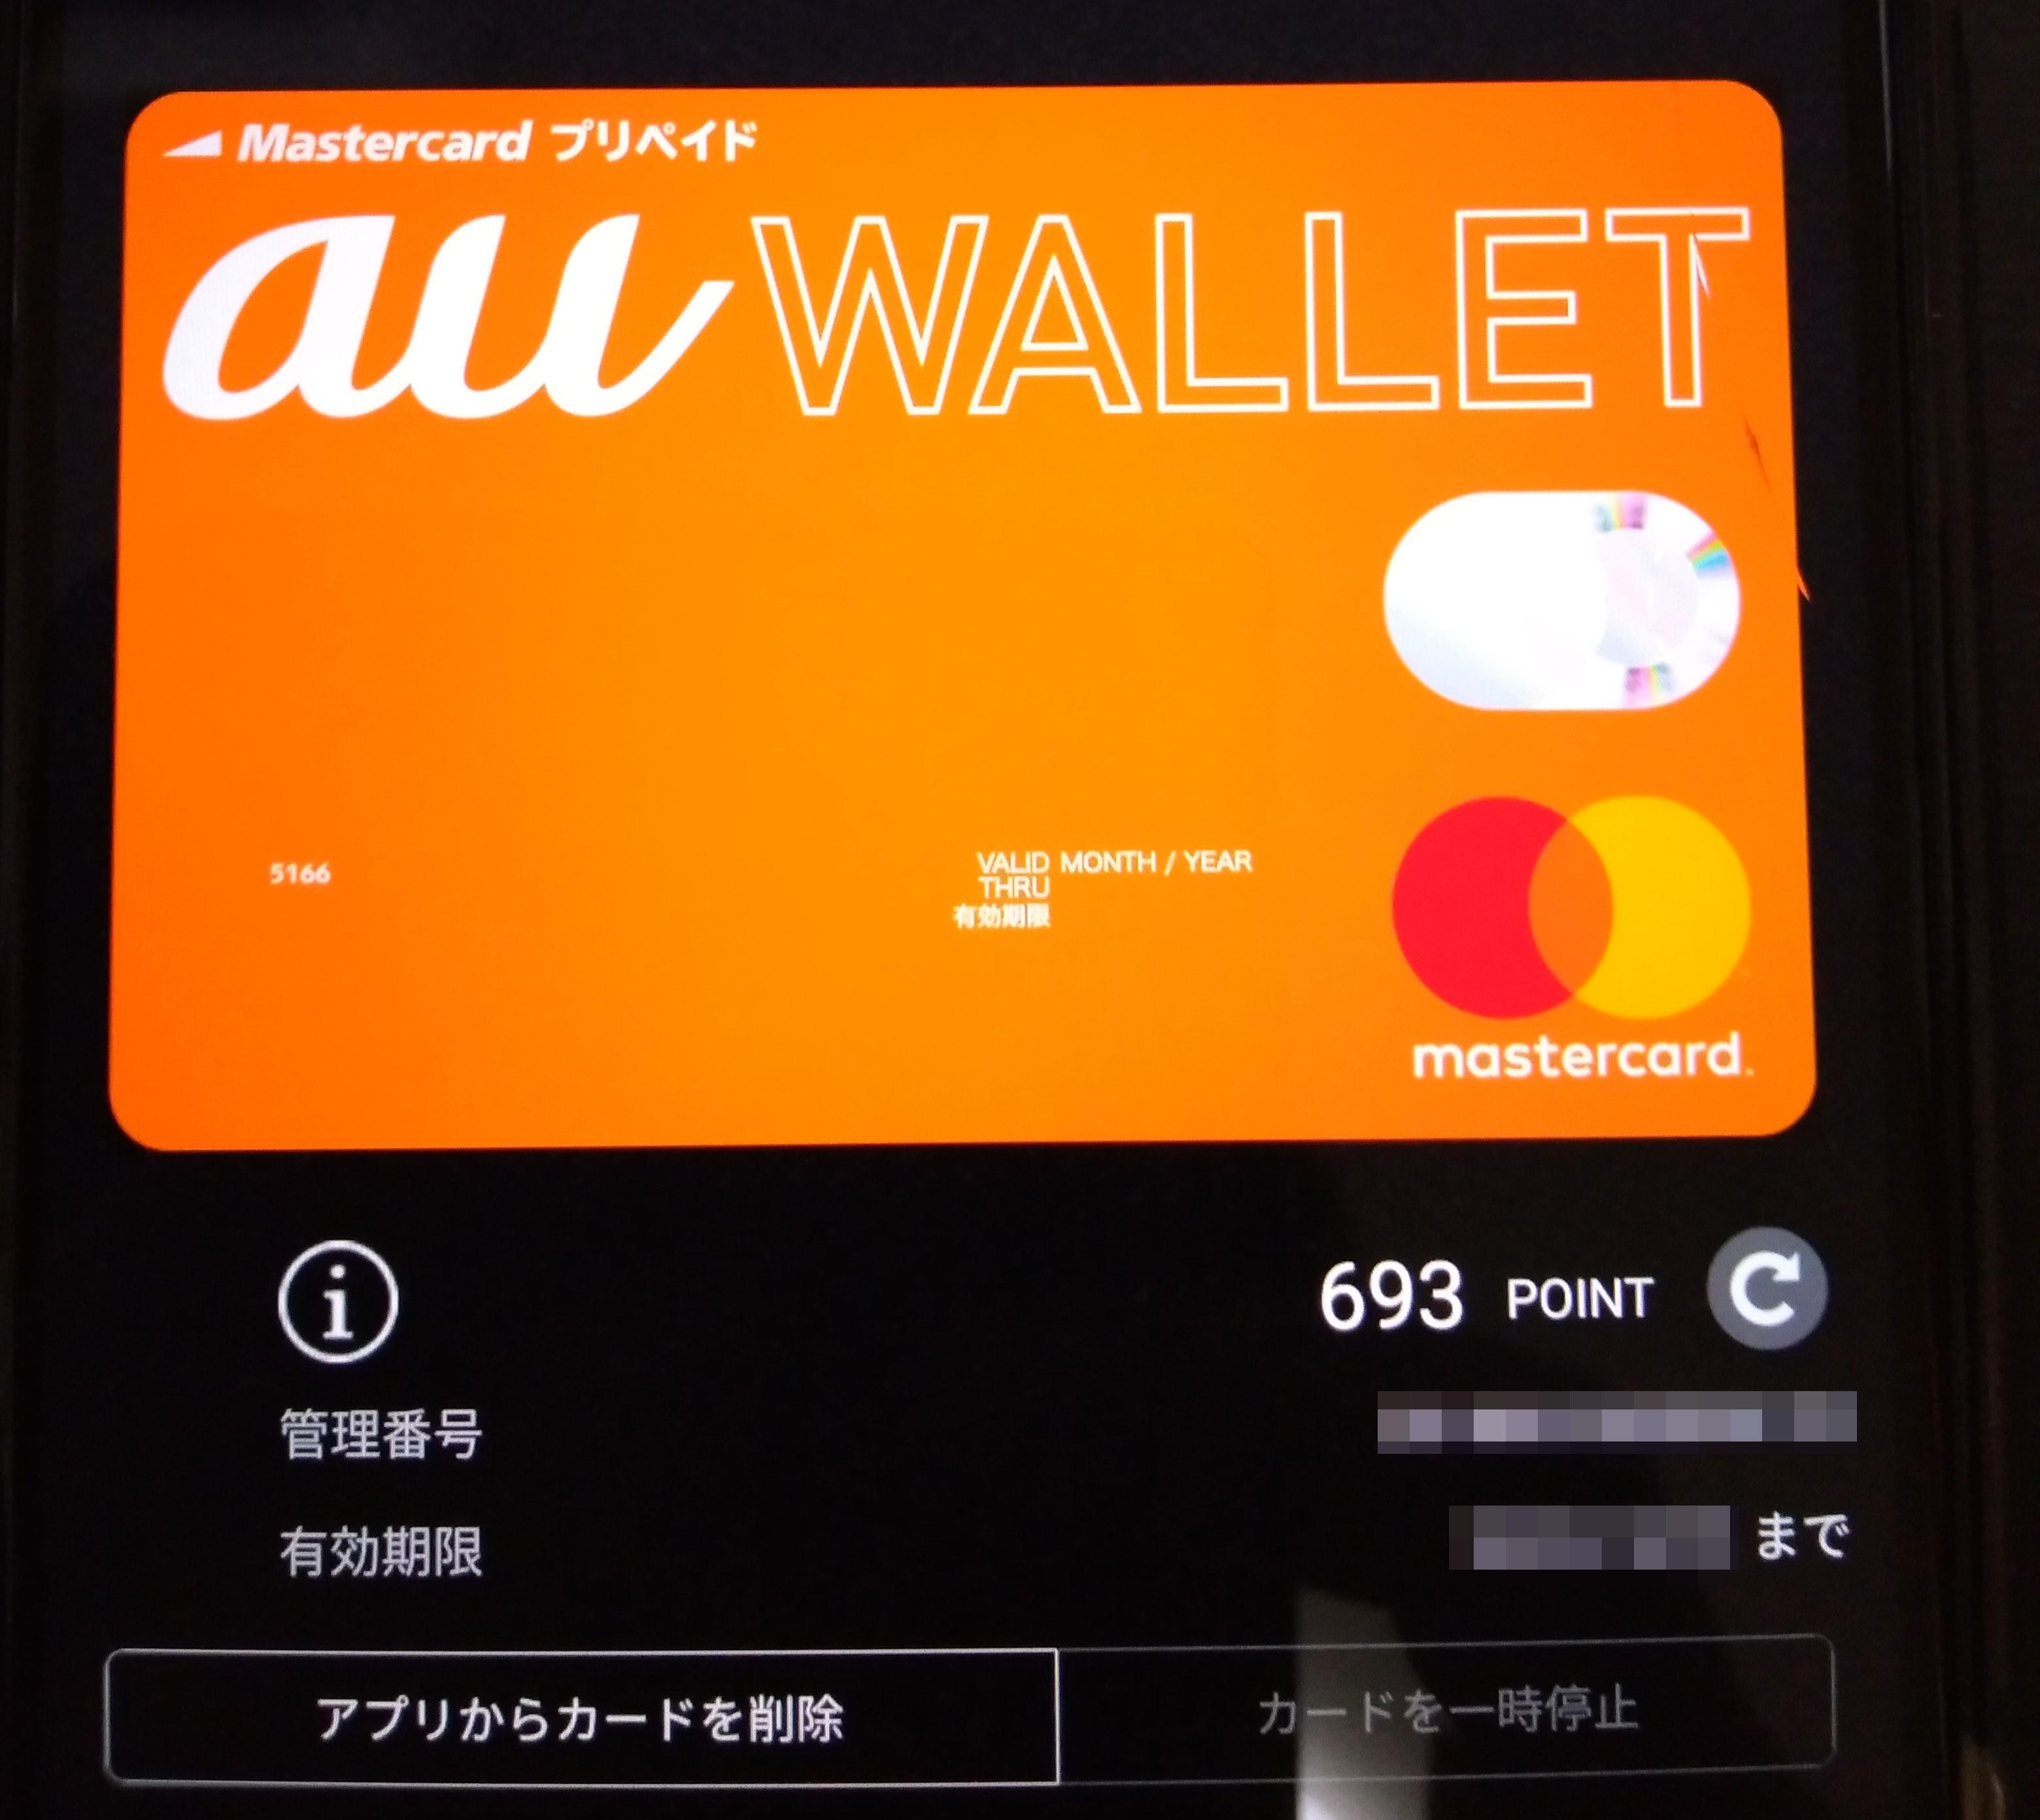 webmoneyカードケースau walletカード登録完了